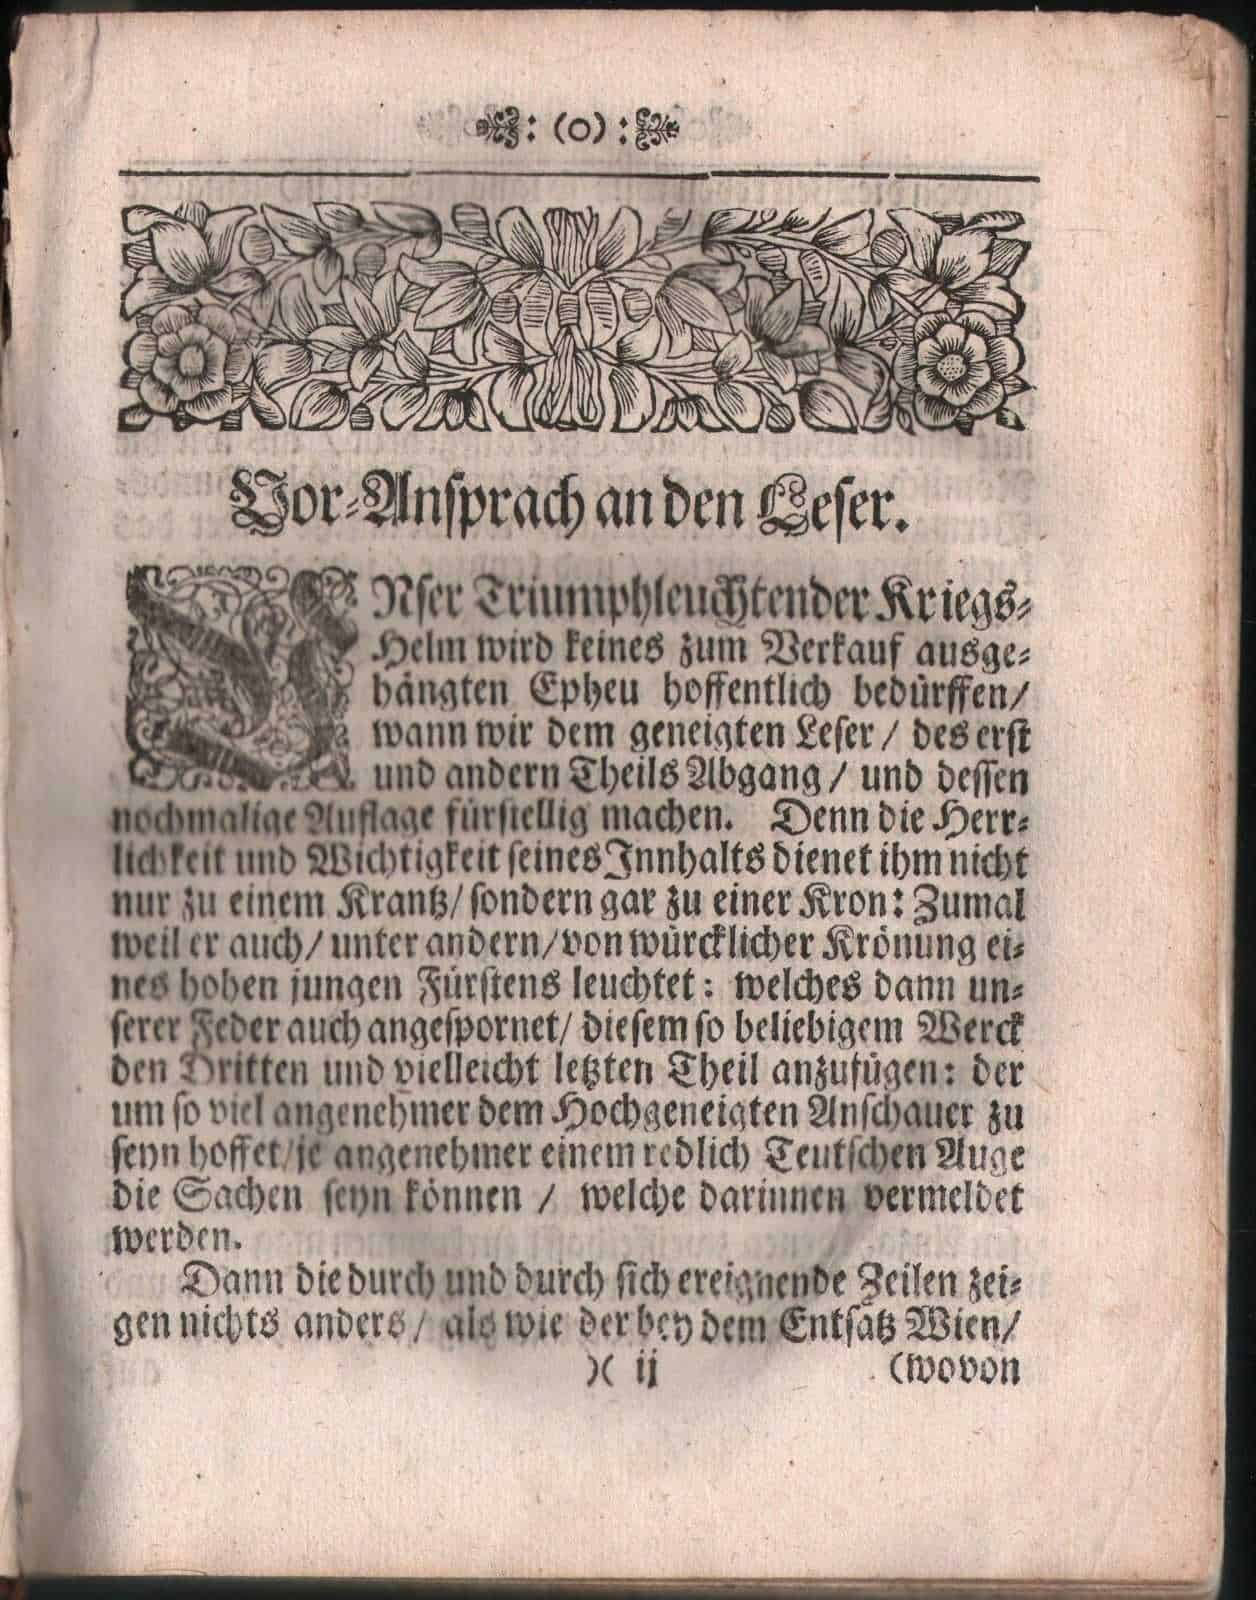 1688-Boethius-TRIUMPH-LEUCHTENDEN-KRIEGS-HELMS-Vol-3-History-Christian-Ottoman-401133054023-4